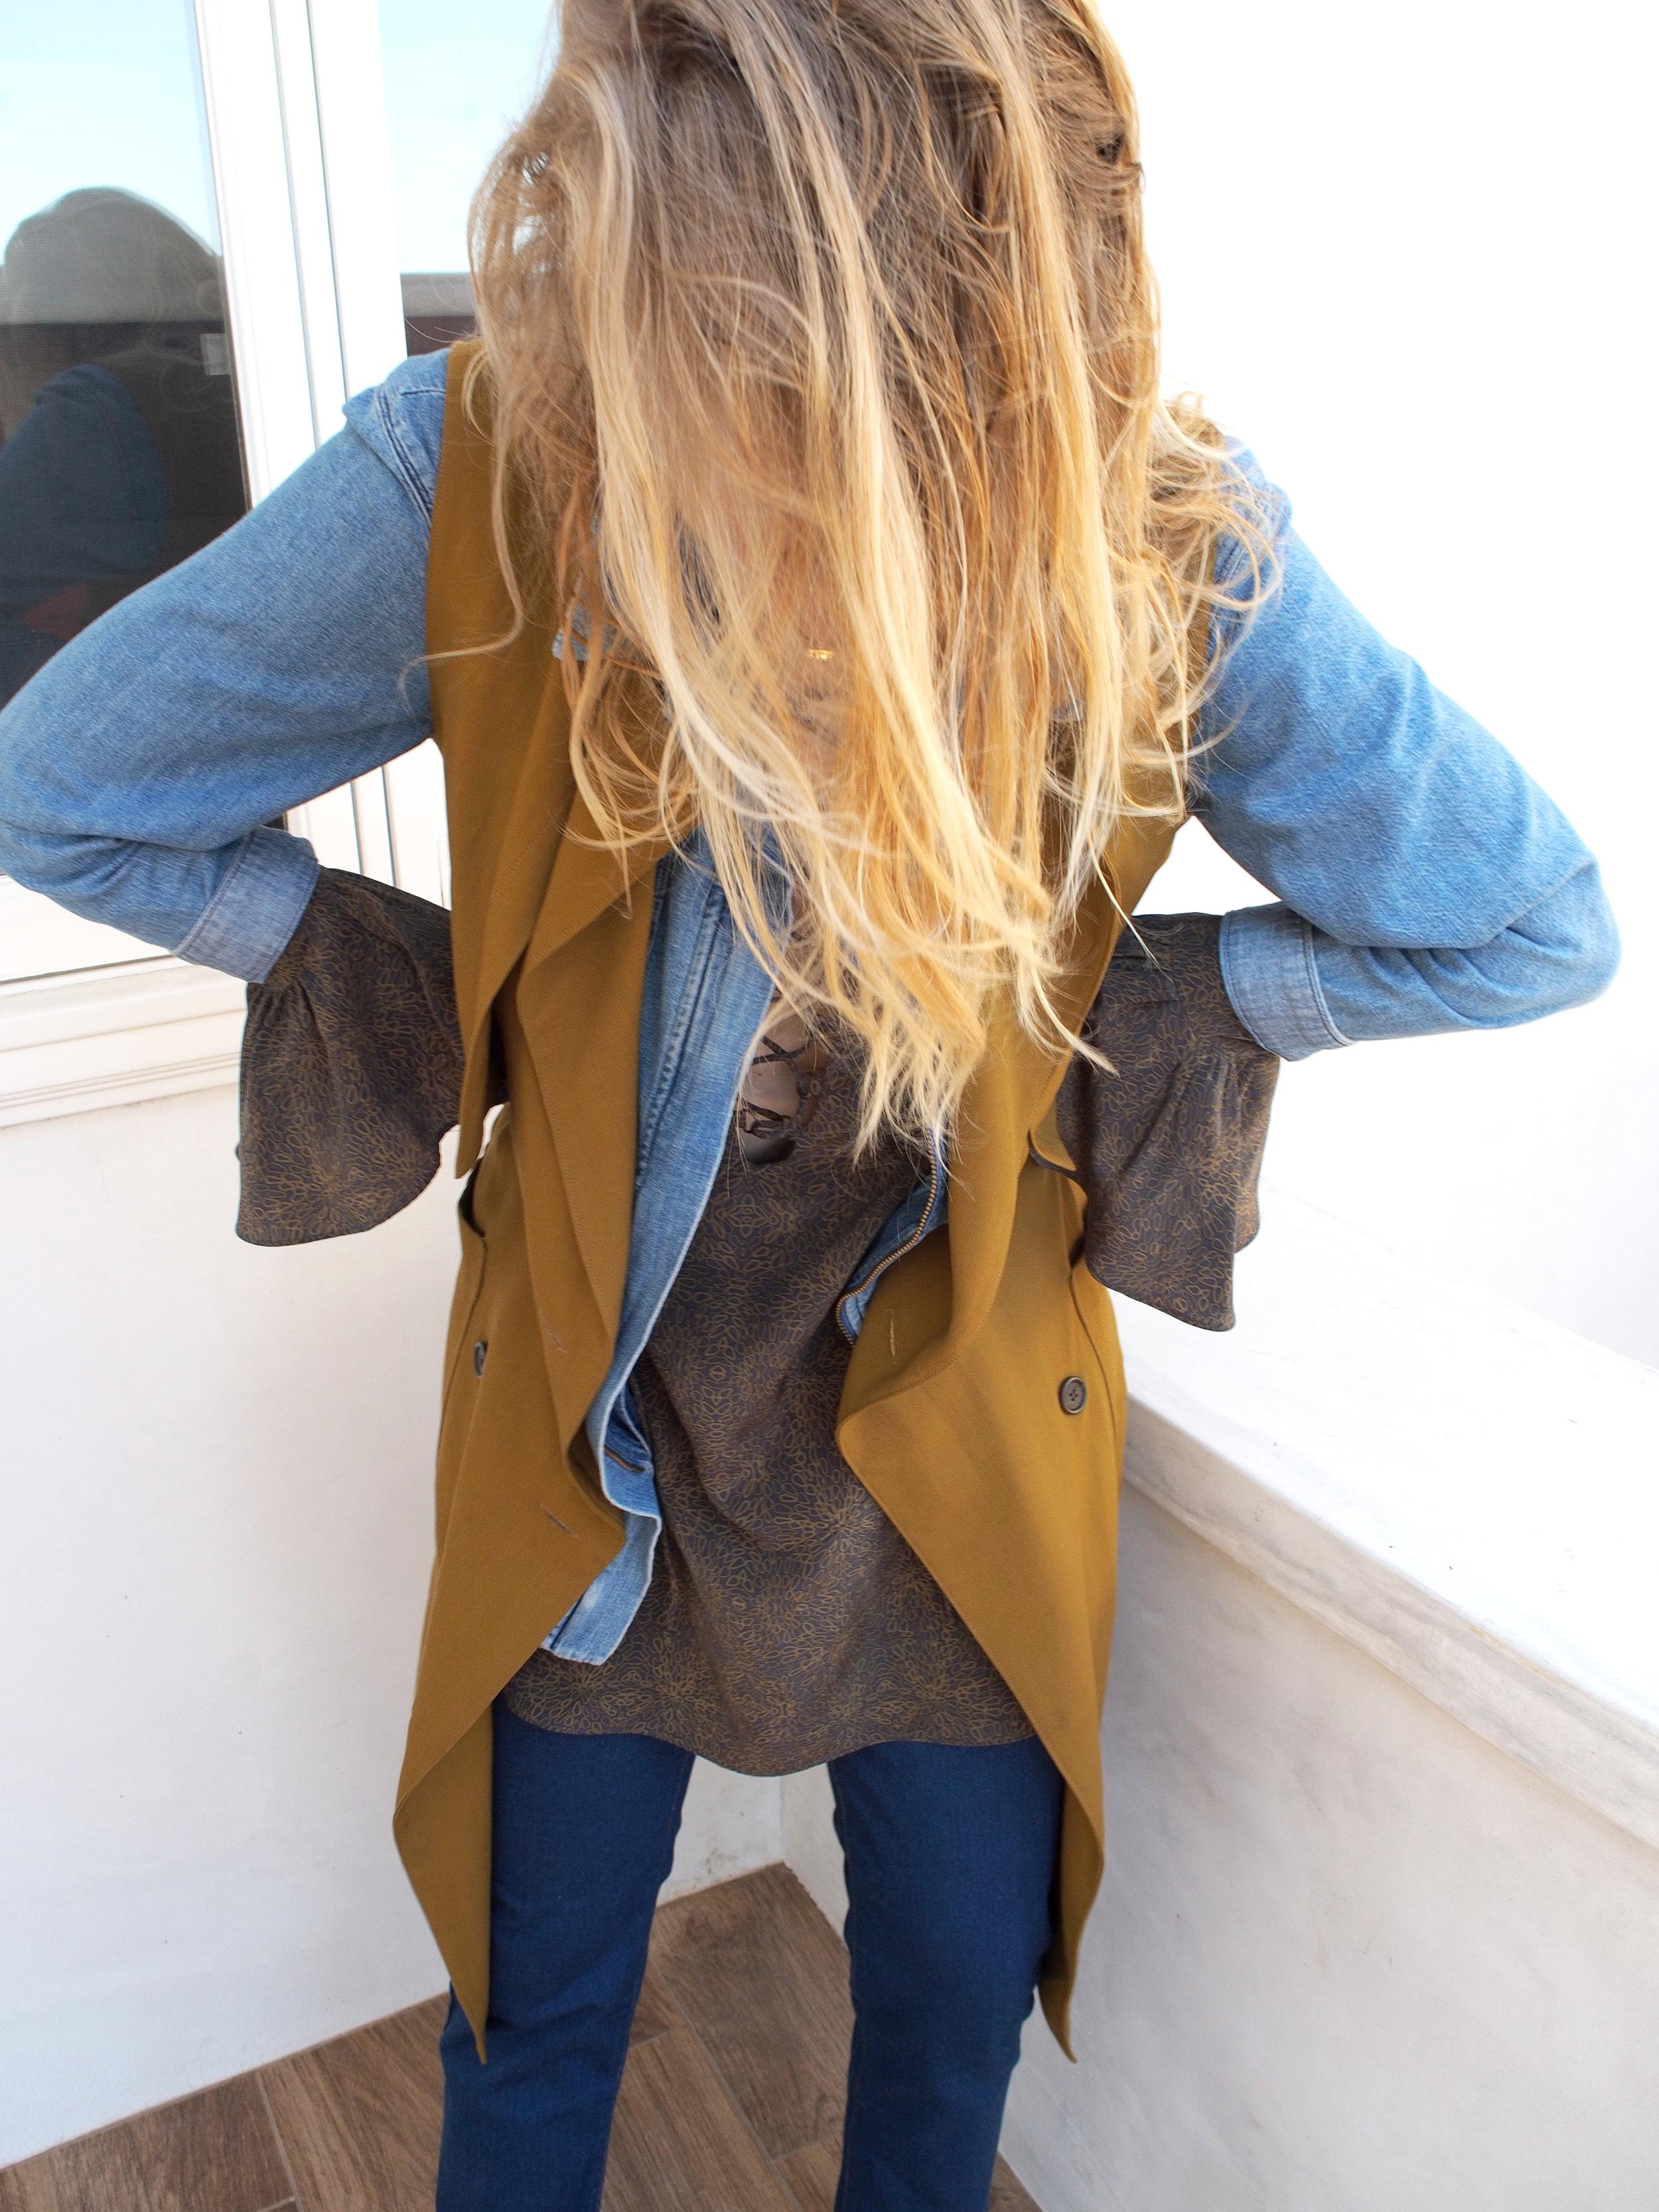 W Concept Denim Story Front Row x Happening Retro Blue Jean M.i.h. Jeans Painter's Parka Waltz Studio Vest ATP Cate Heels x Taylr Anne www.taylranne.com